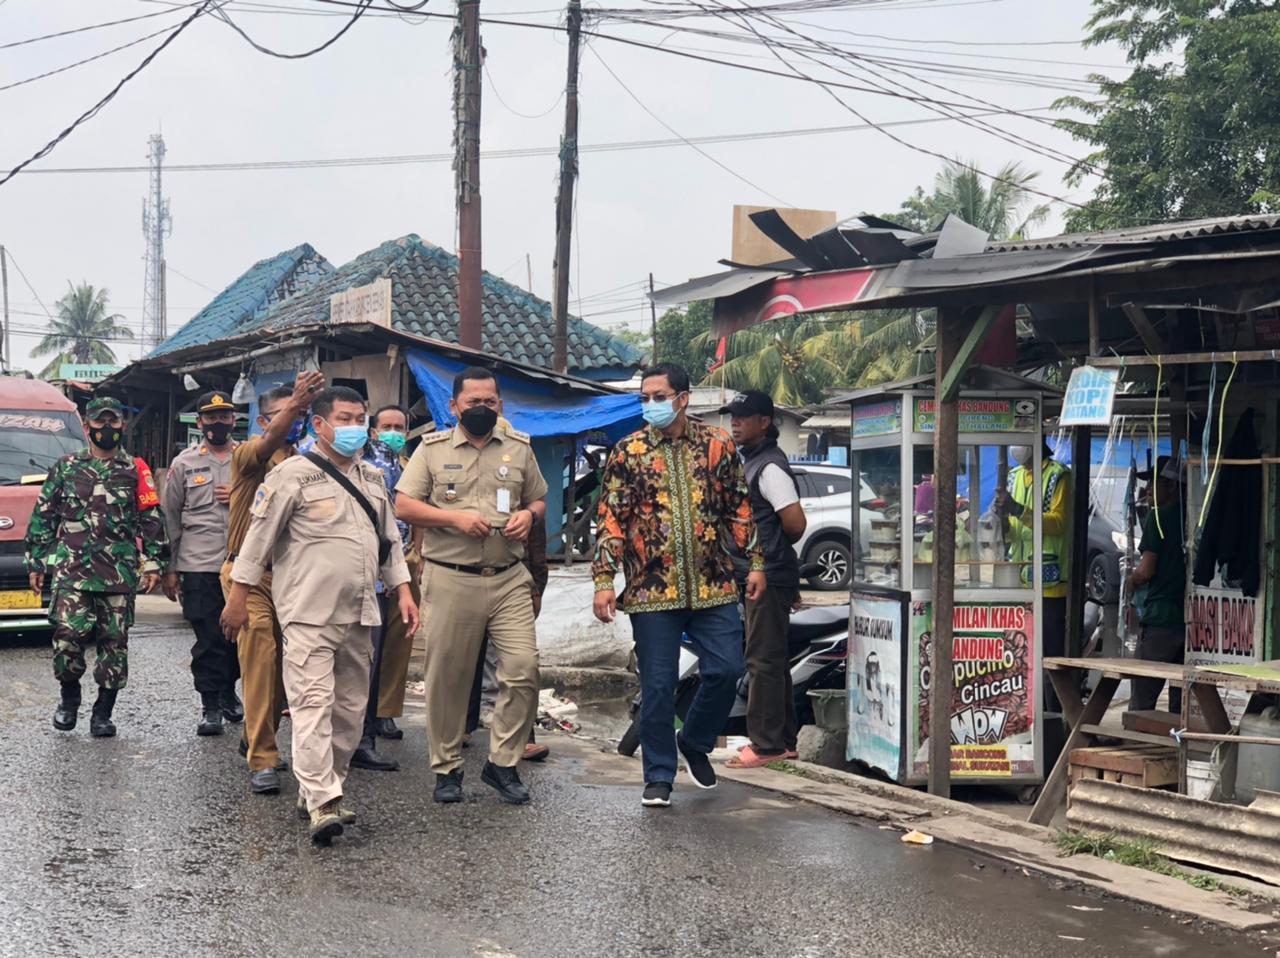 Tinjau Pasar Sukatani, Komisi II DPRD  Kab.Bekasi Sorot Masalah Revitalisasi